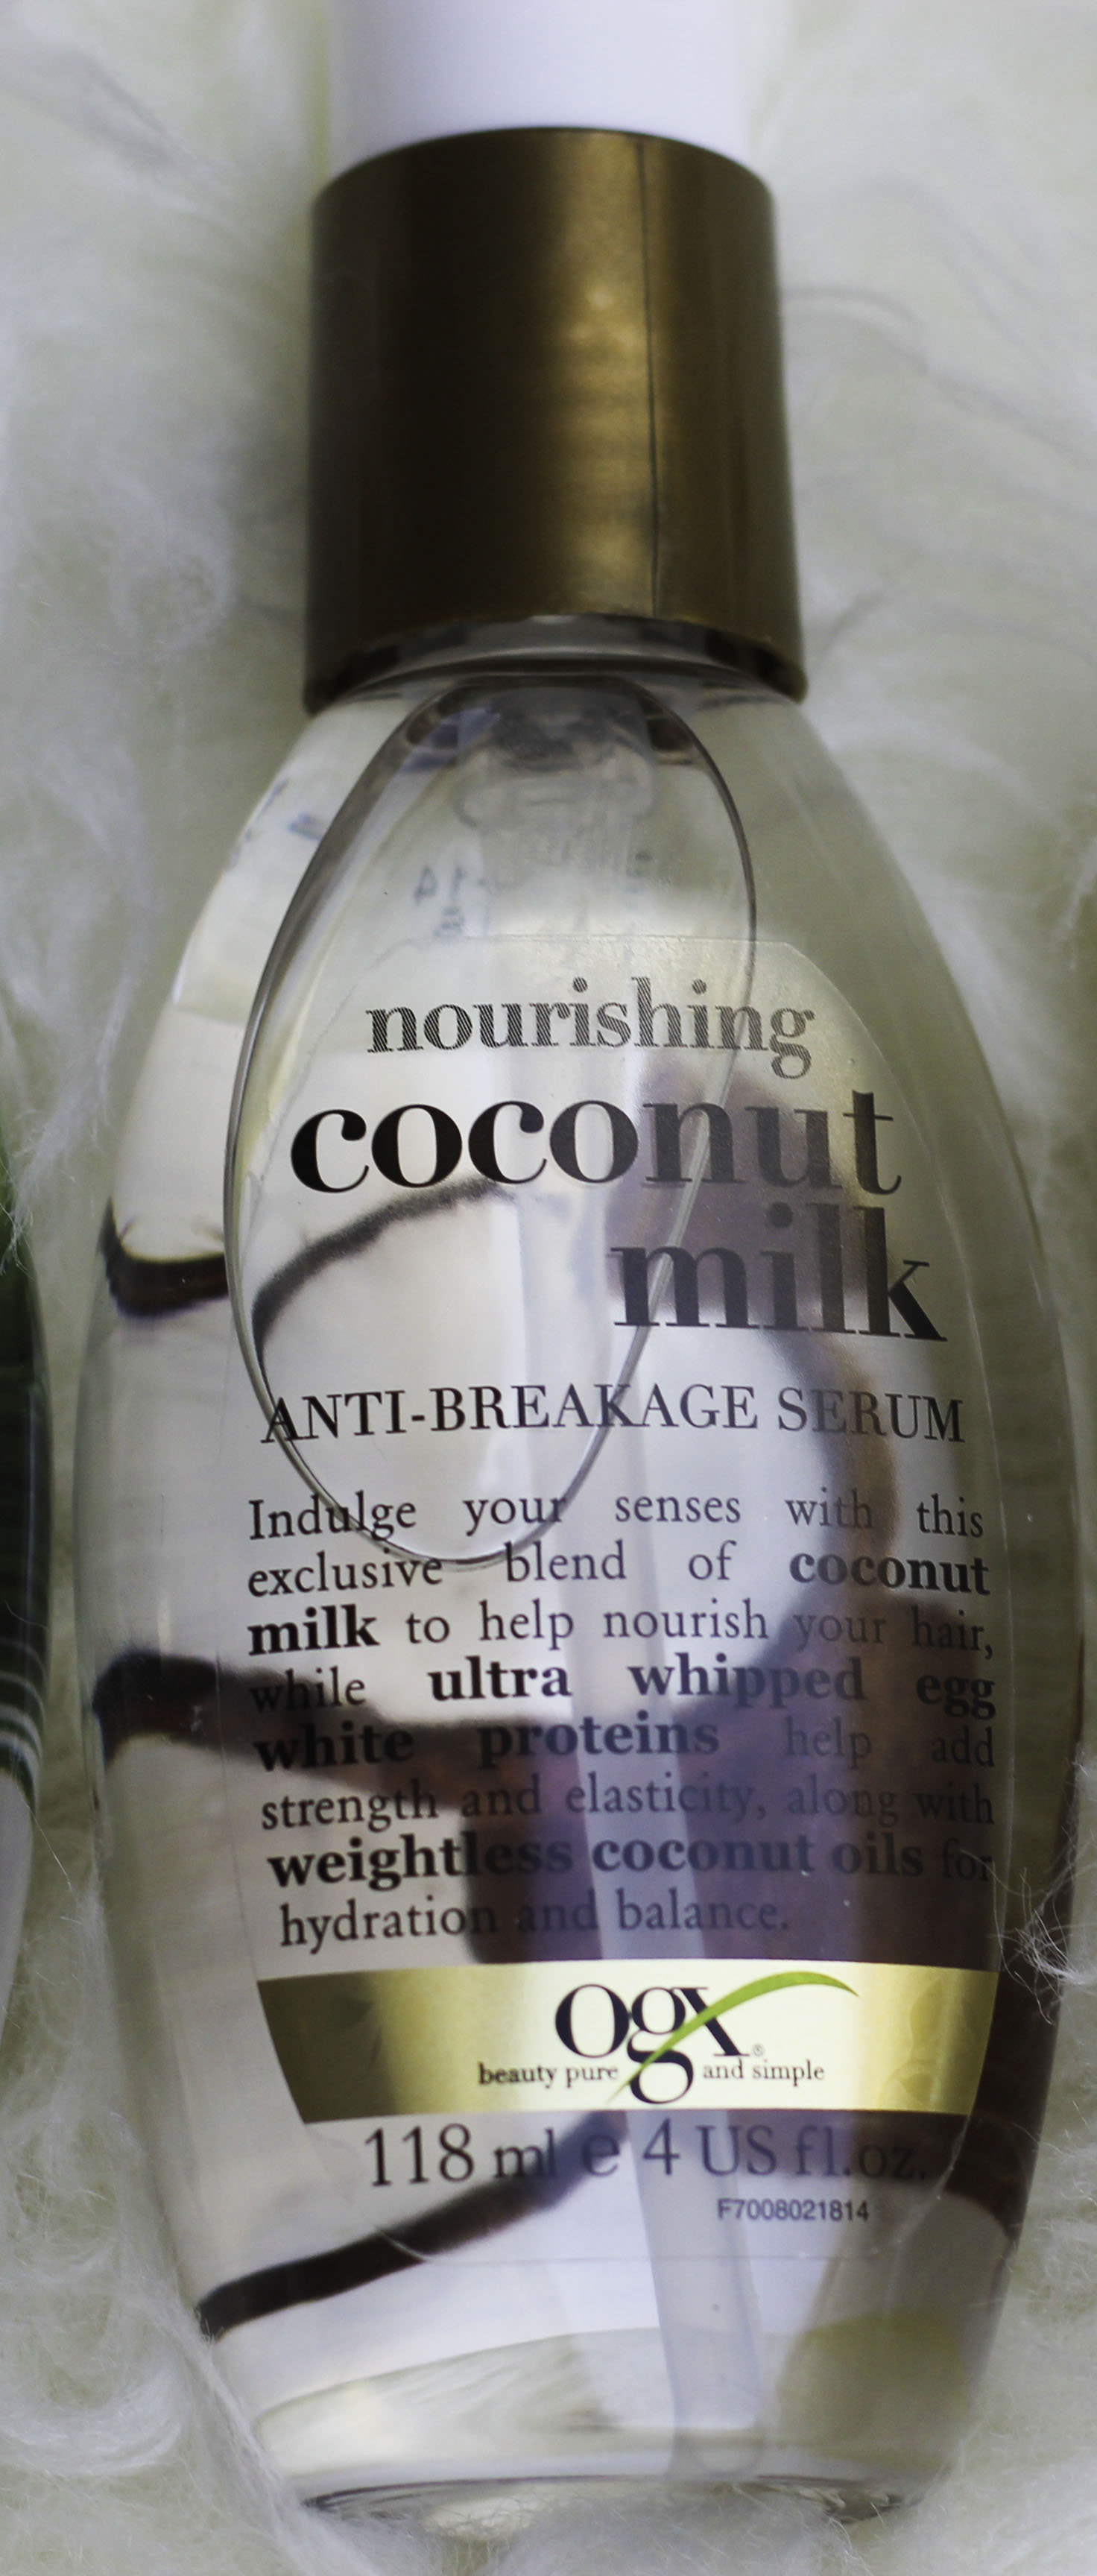 Product Review OGX Coconut Milk Hair Range